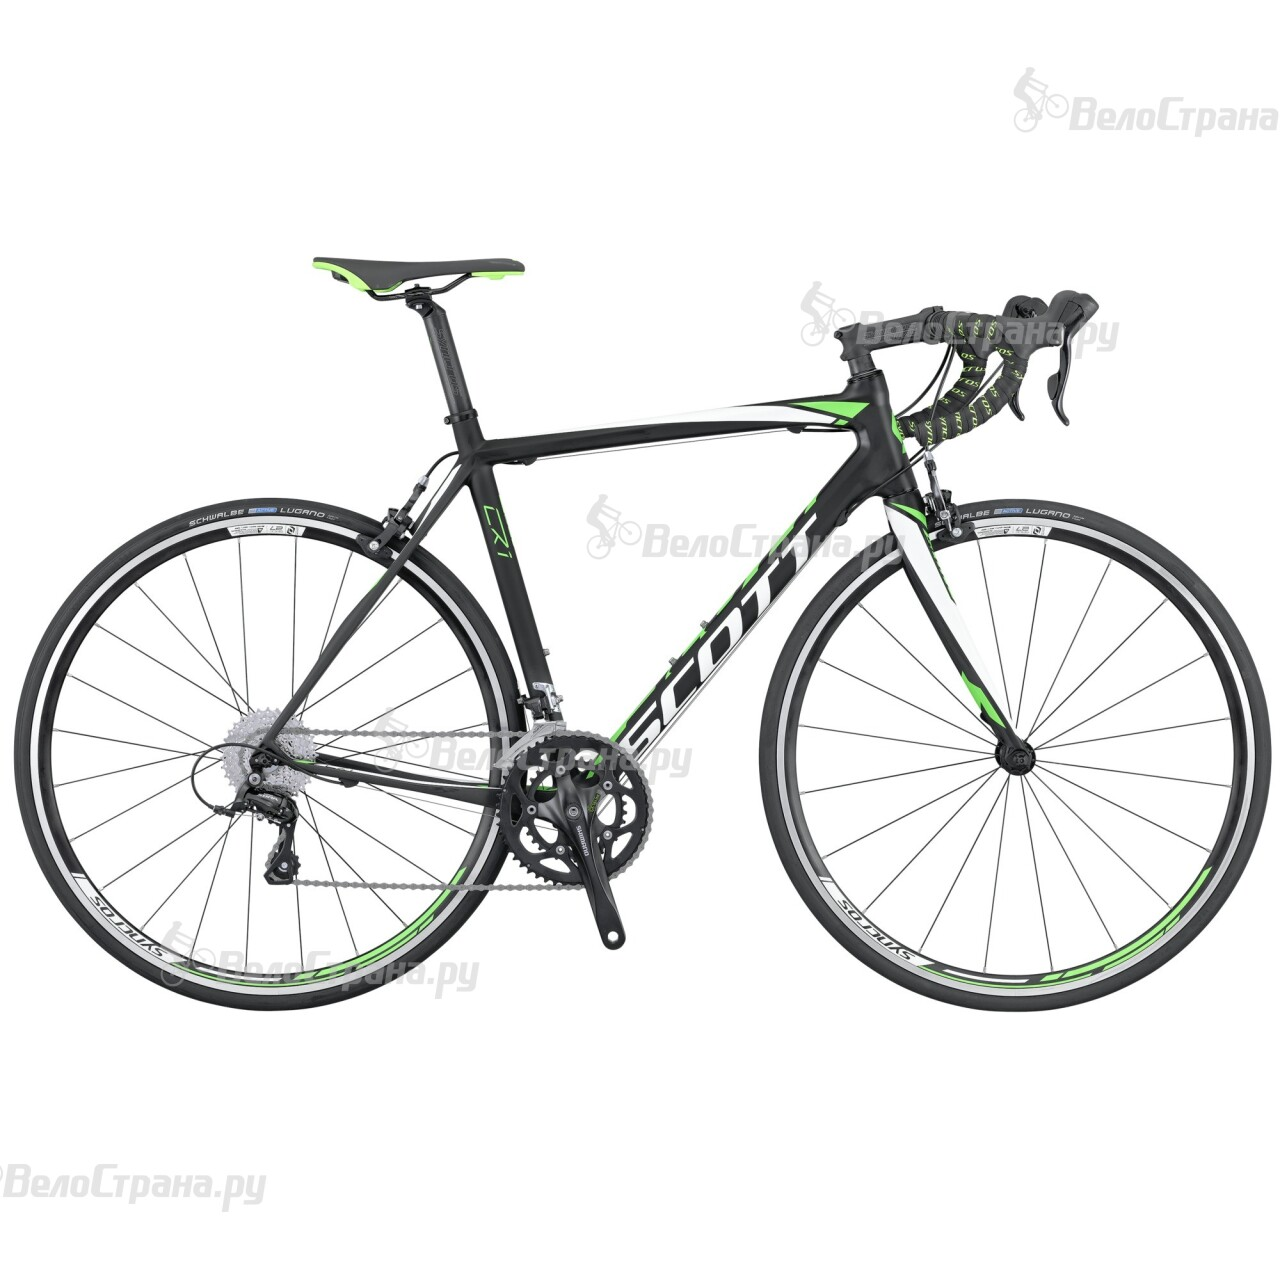 Велосипед Scott CR1 30 (2016) велосипед scott cr1 20 2017